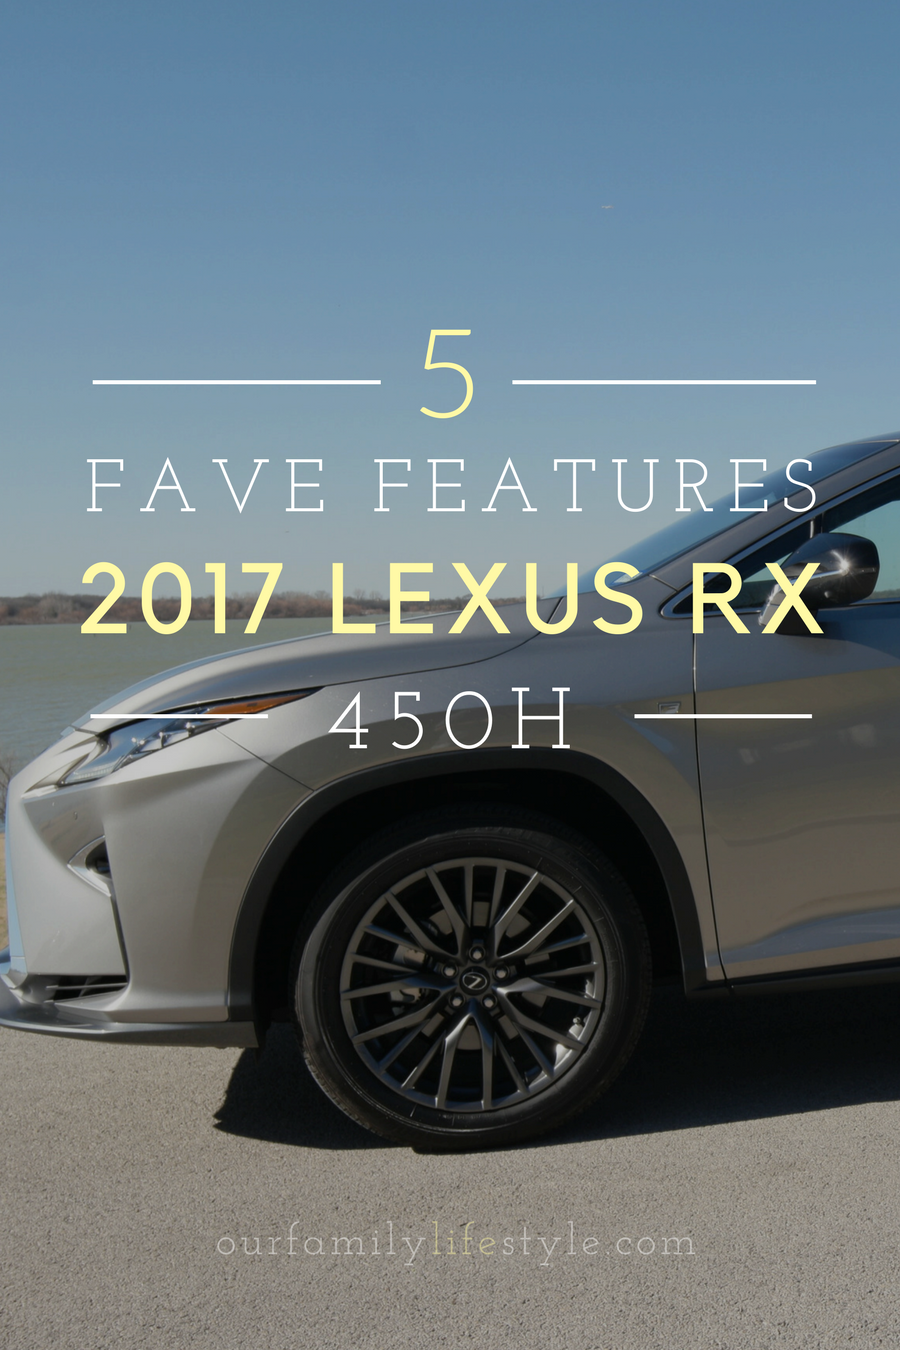 favorite features of 2017 Lexus RX 450h